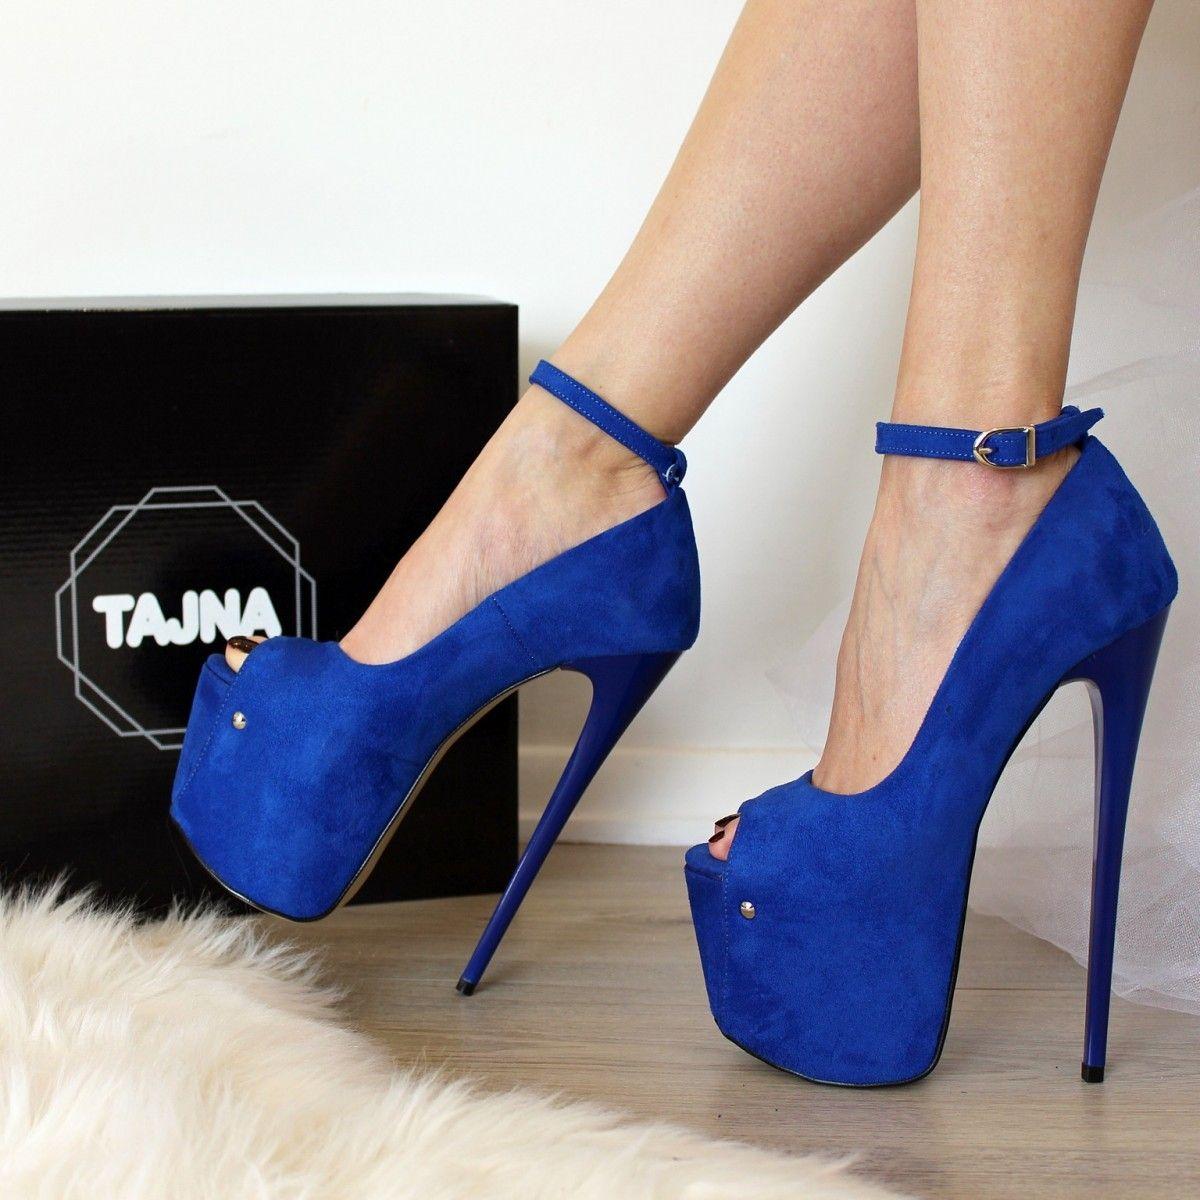 Tajna 20 Cm Saks Mavi Bilekten Bantli Yuksek Ince Topuklu Platform Abiye Ayakkabi Sadece 399 00tl Super Mega Topuk Heels Yeezy Shoes Women Casual Shoes Women